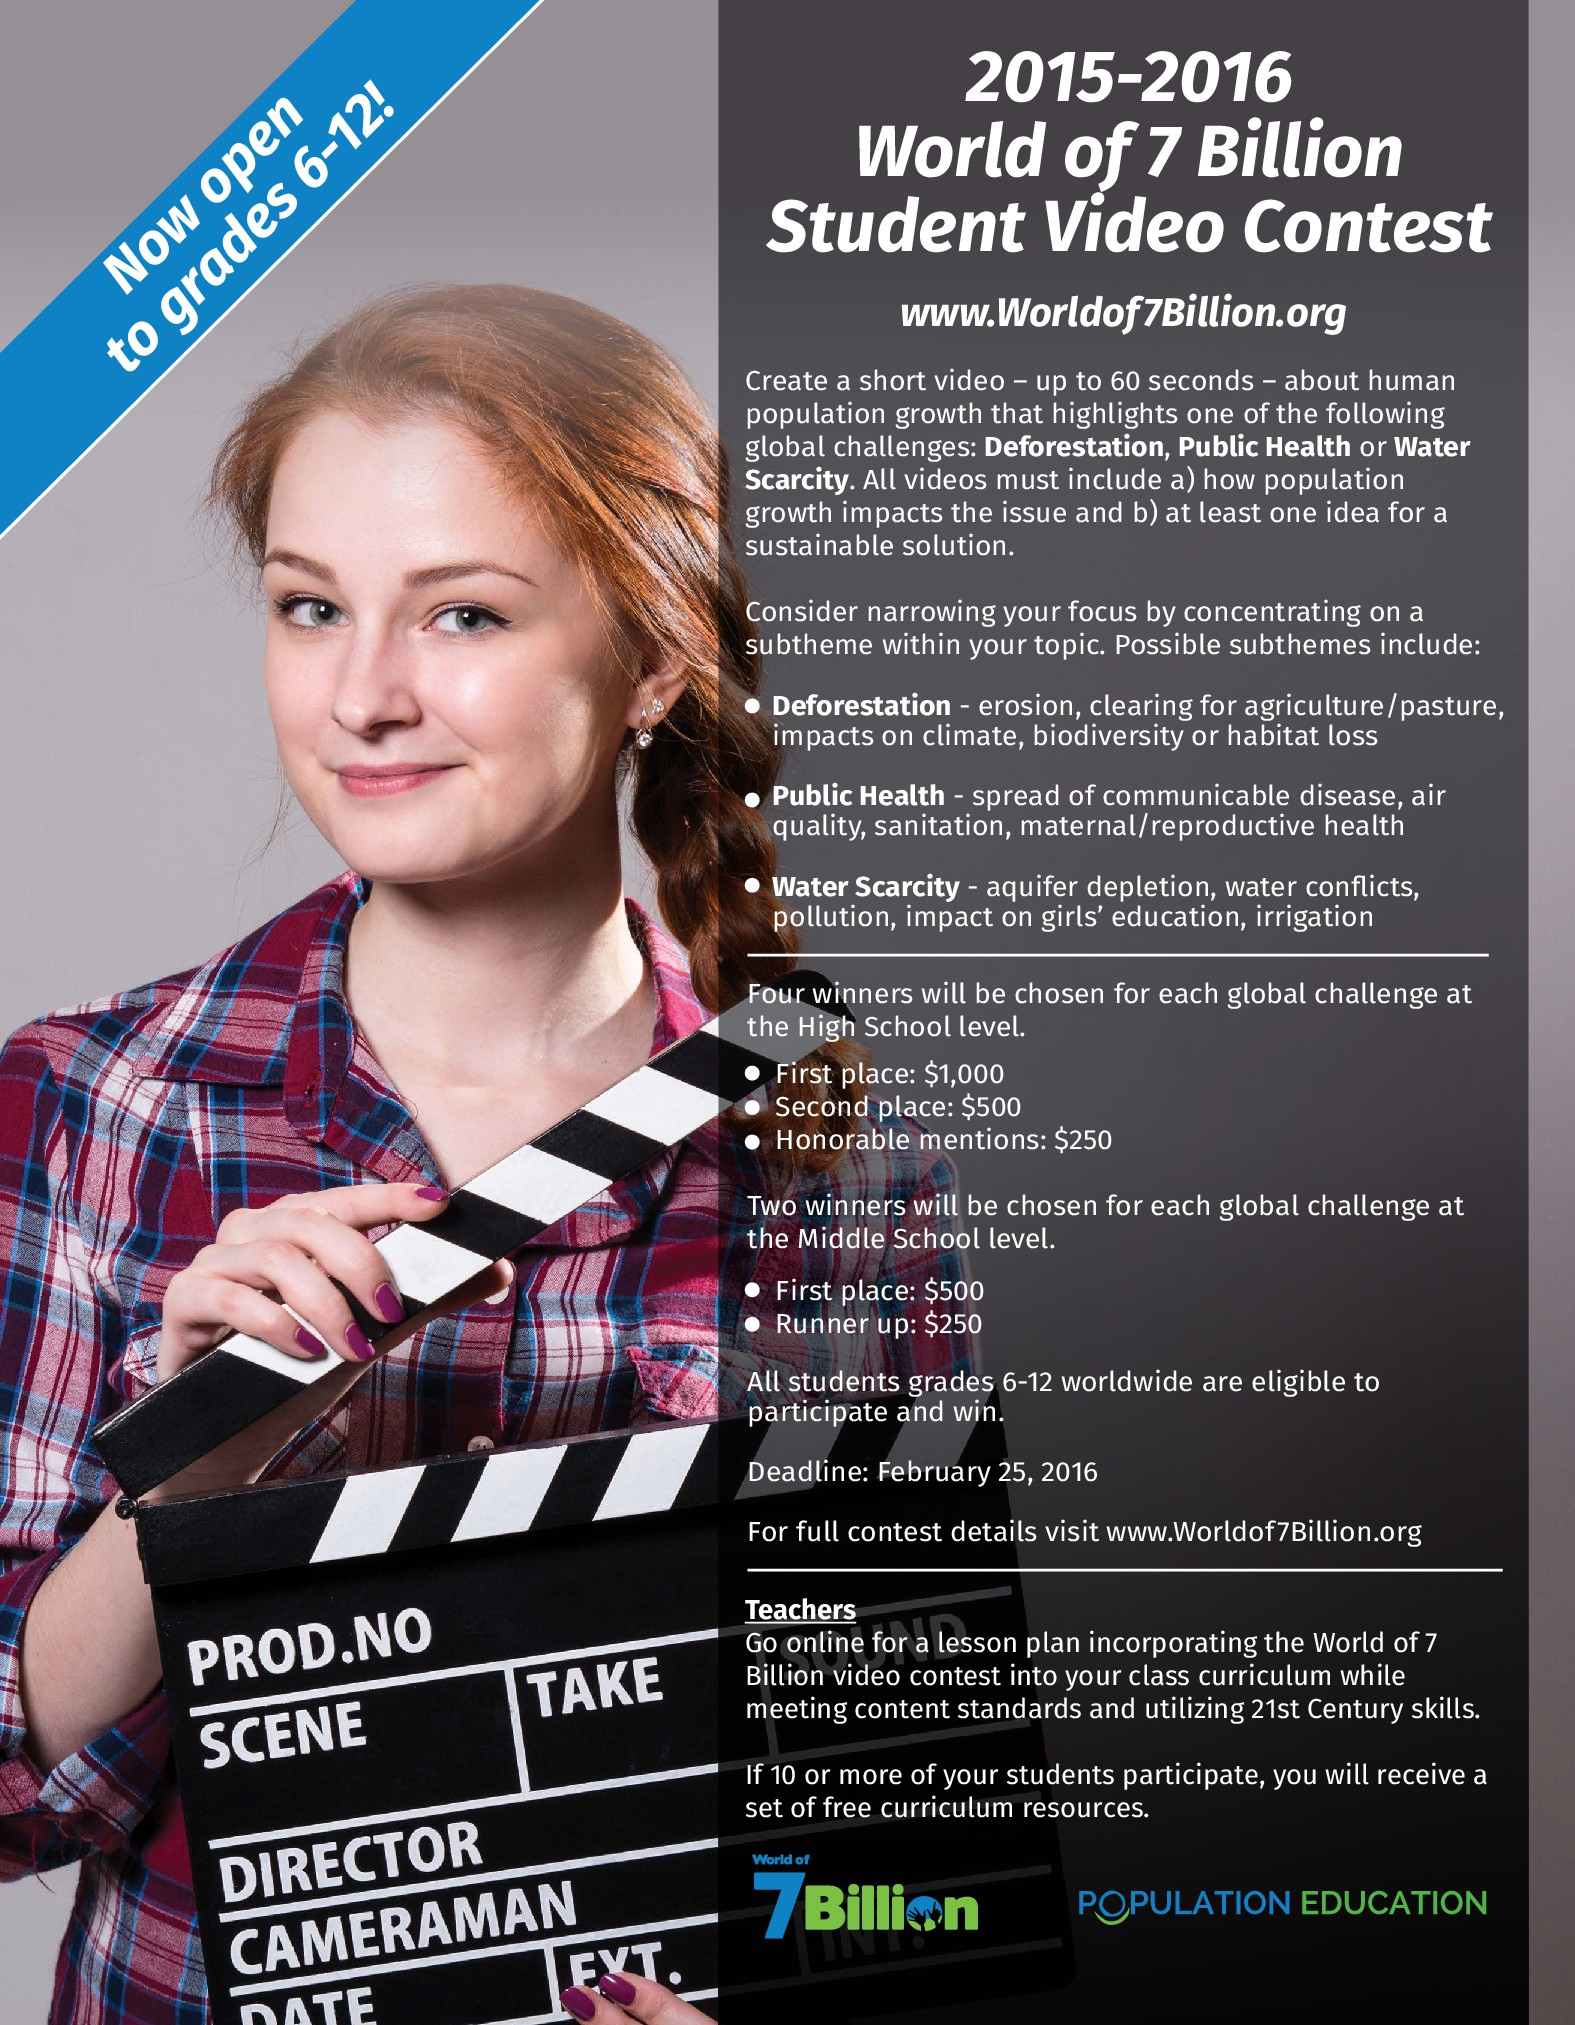 World of 7 Billion student video contest flyer